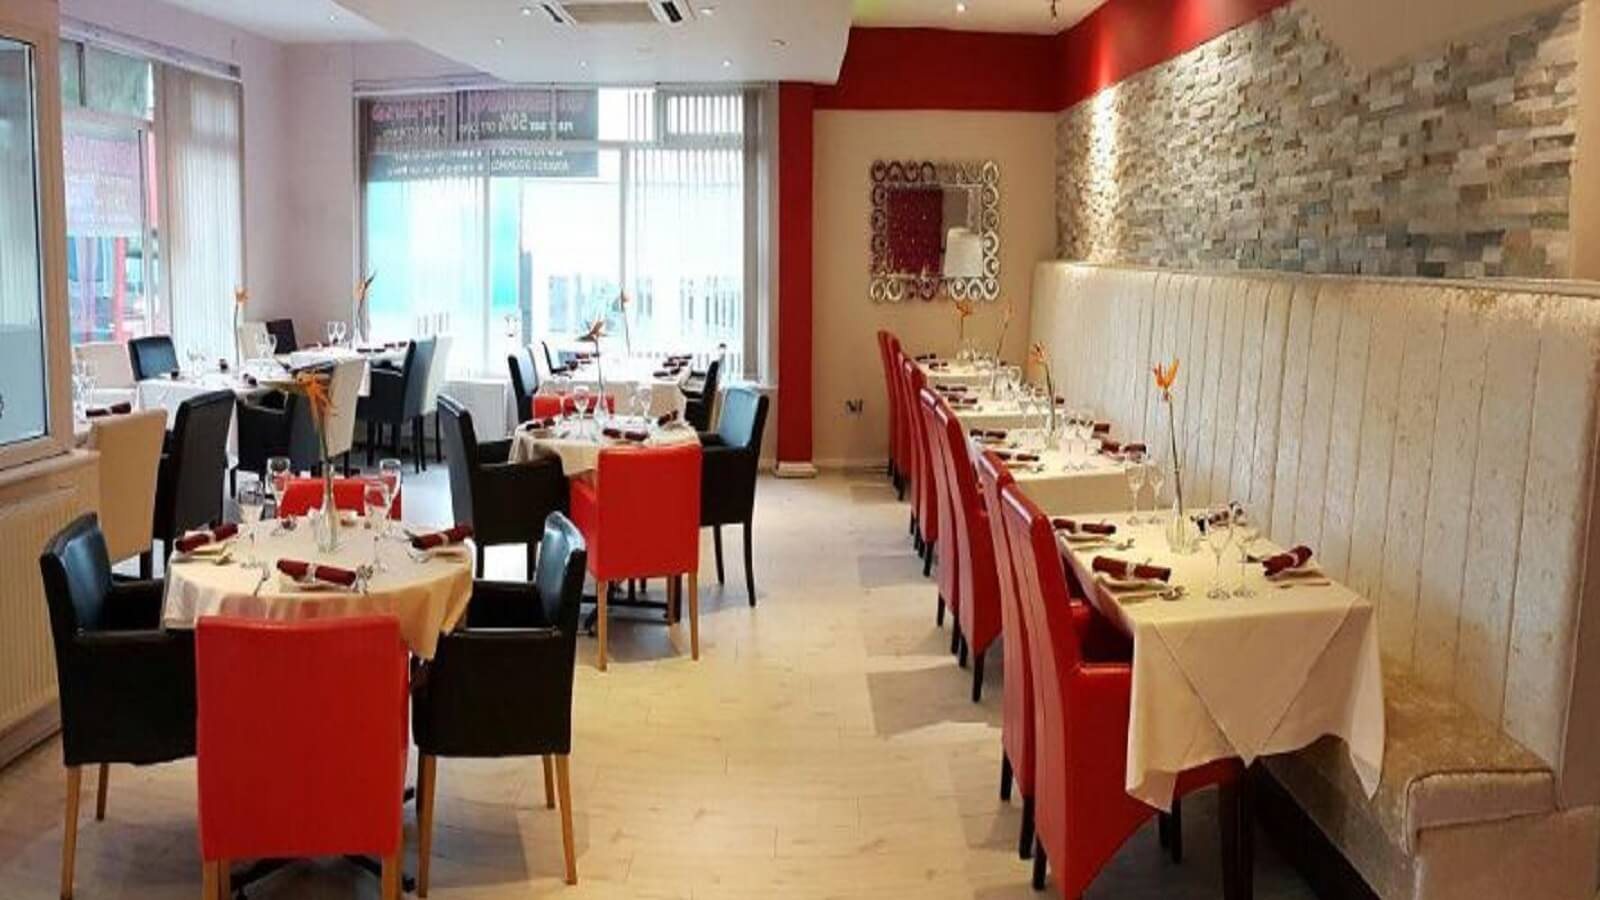 Aashiqs Restaurant